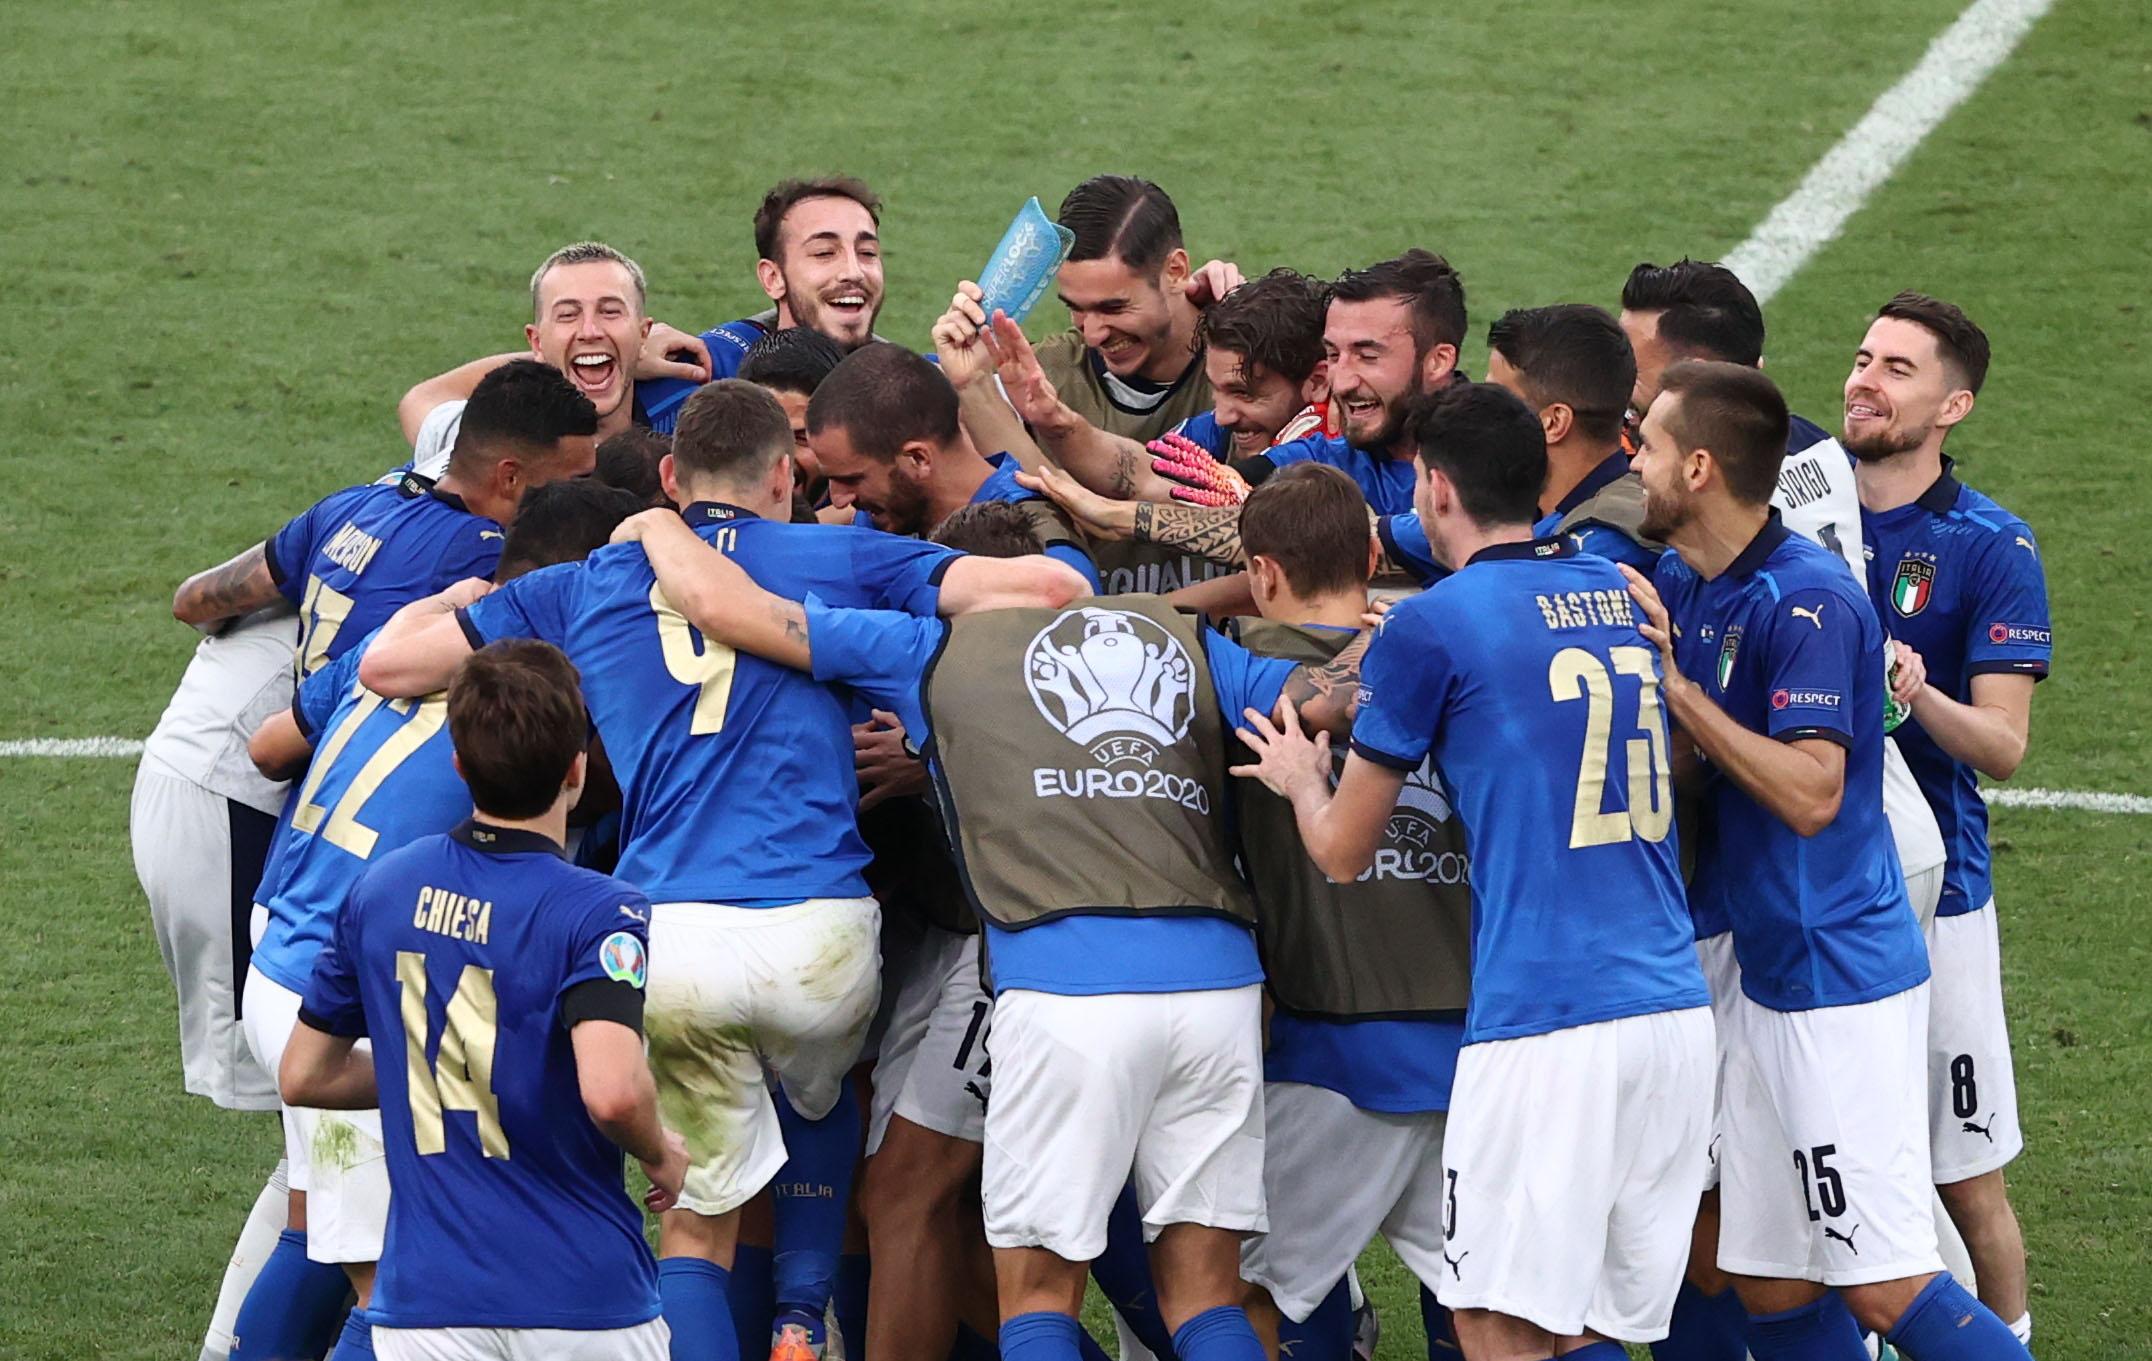 Euro 2020: Η Ιταλία ισοφάρισε «μυθικό» ρεκόρ 82 ετών